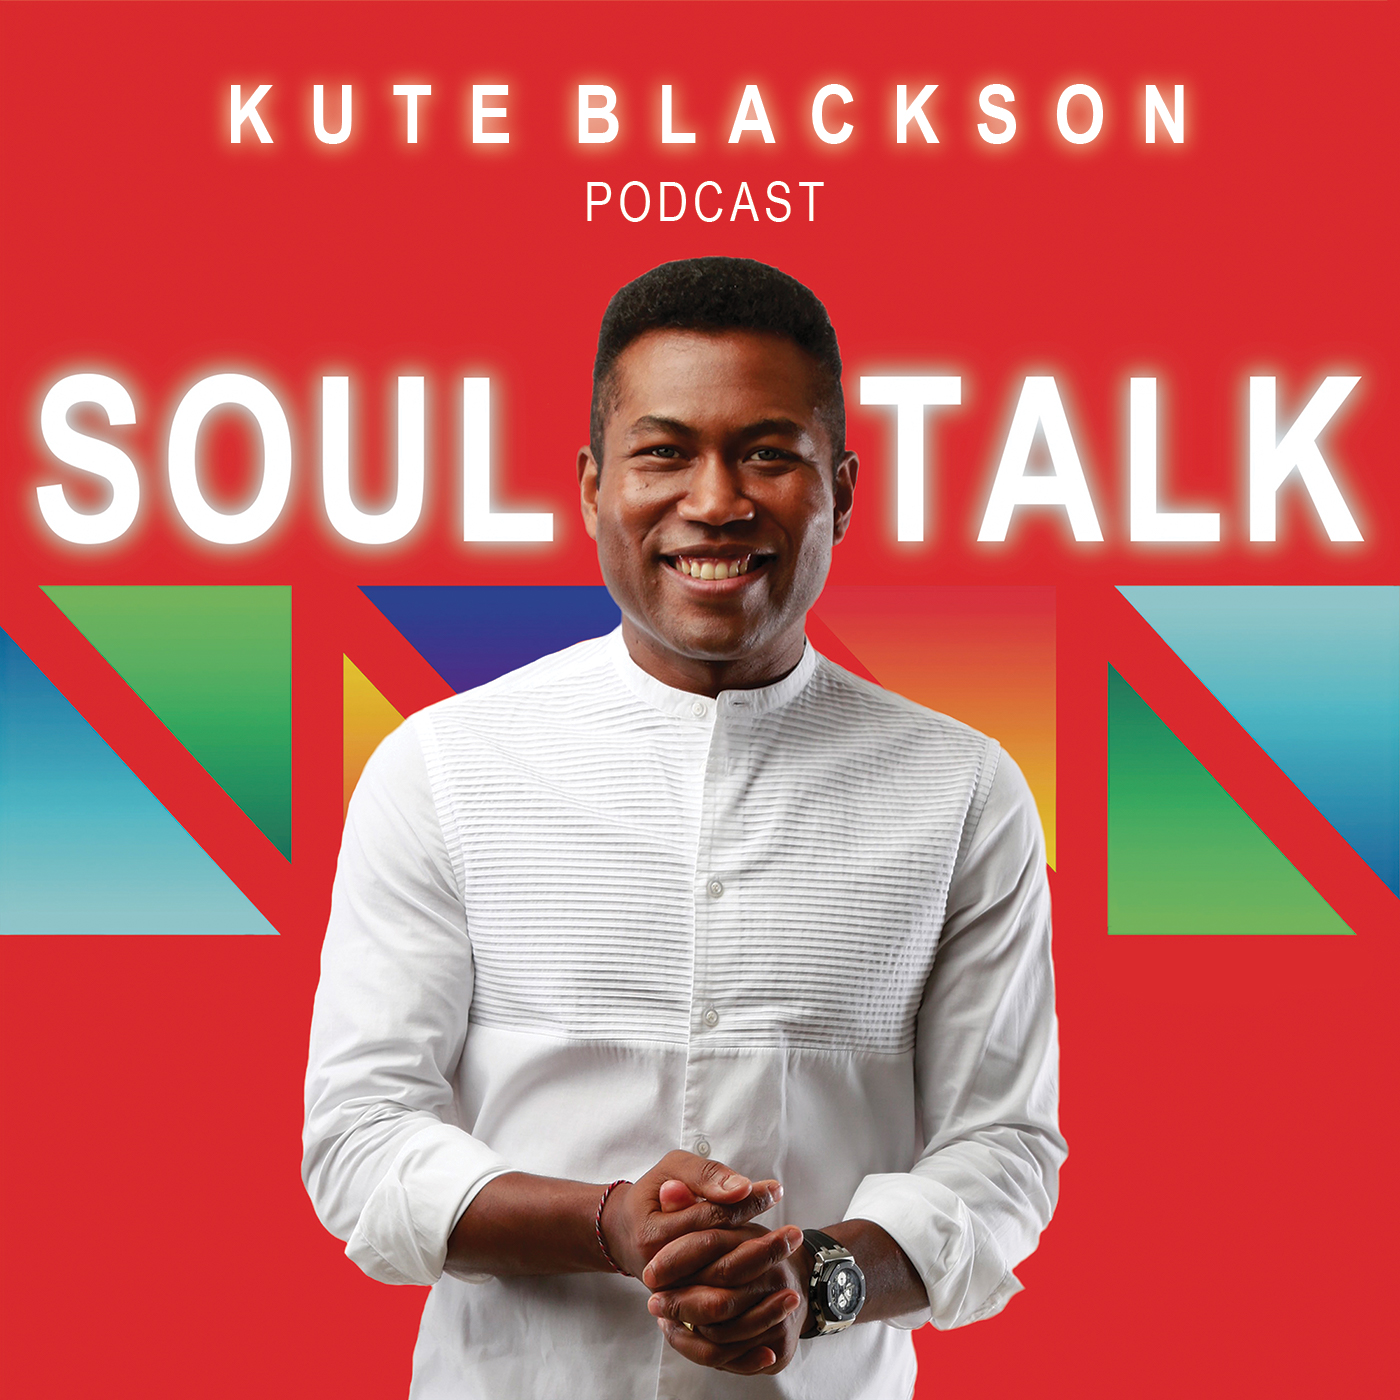 SoulTalk with Kute Blackson show art